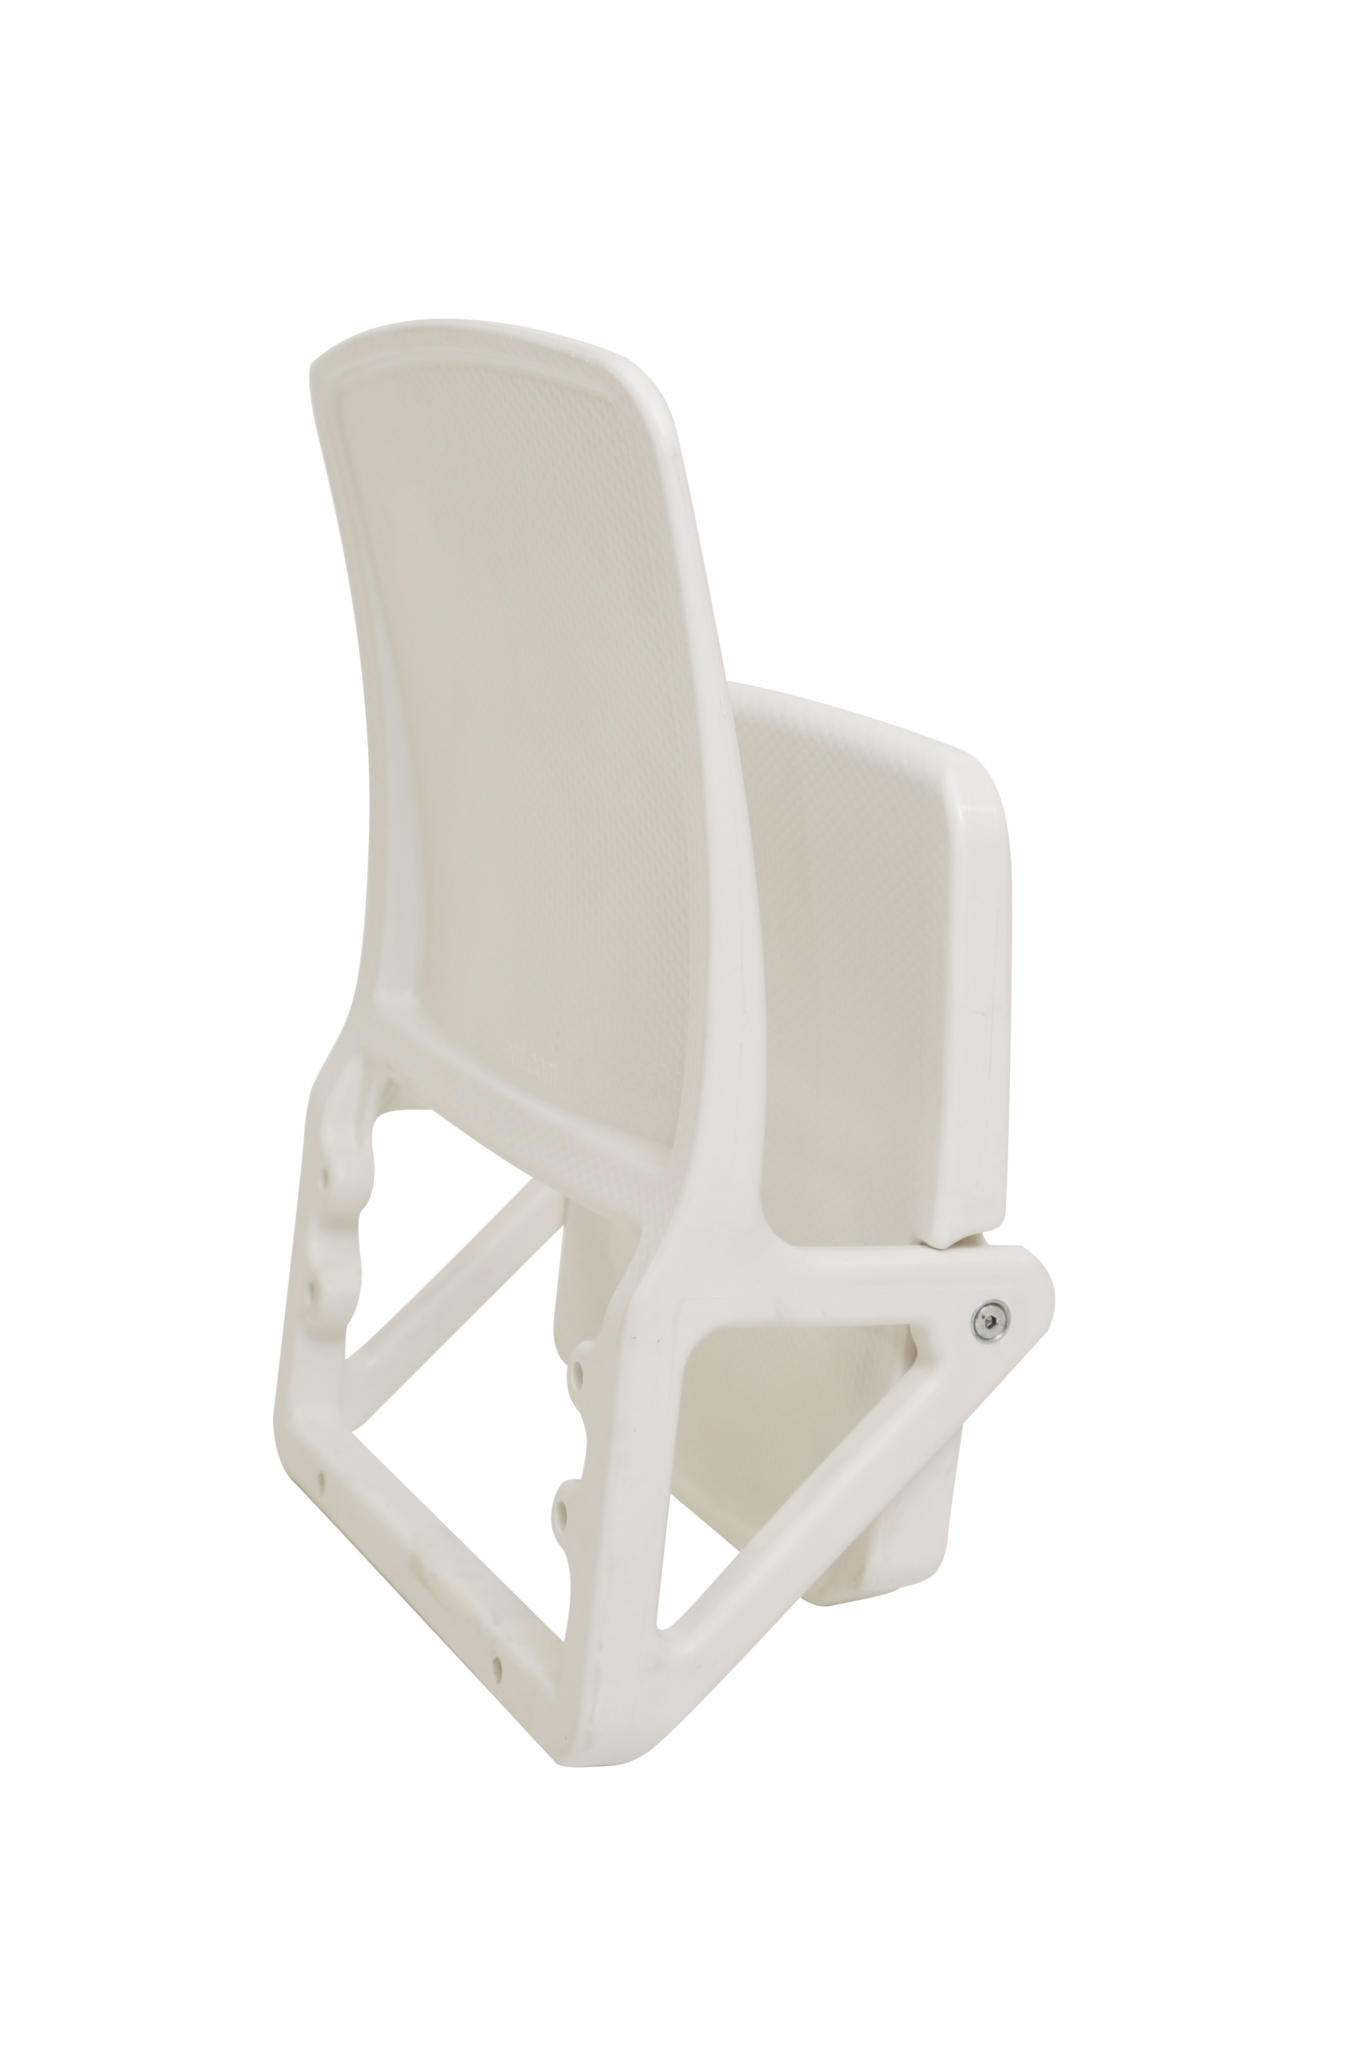 omega_tipup_backrest_monoblock_copolymer_pp_stadium_chair_seatorium_15